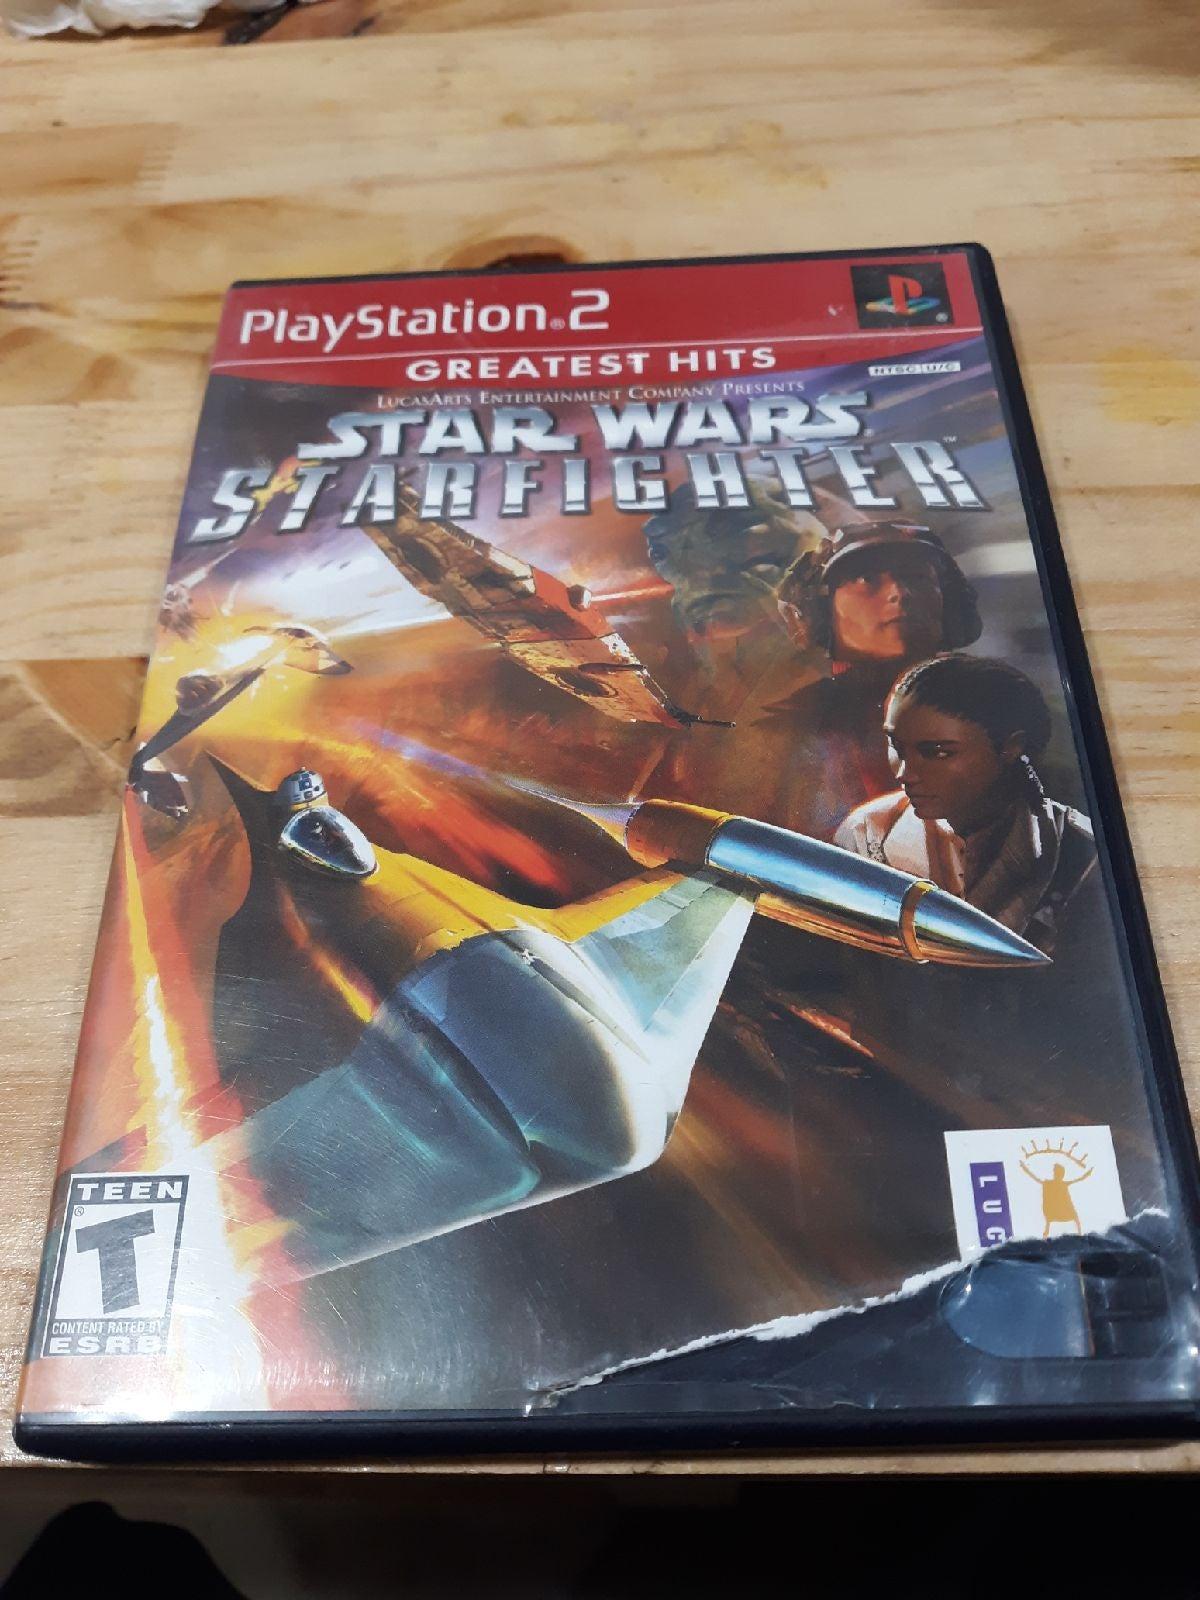 Star Wars Starfighter on PS2